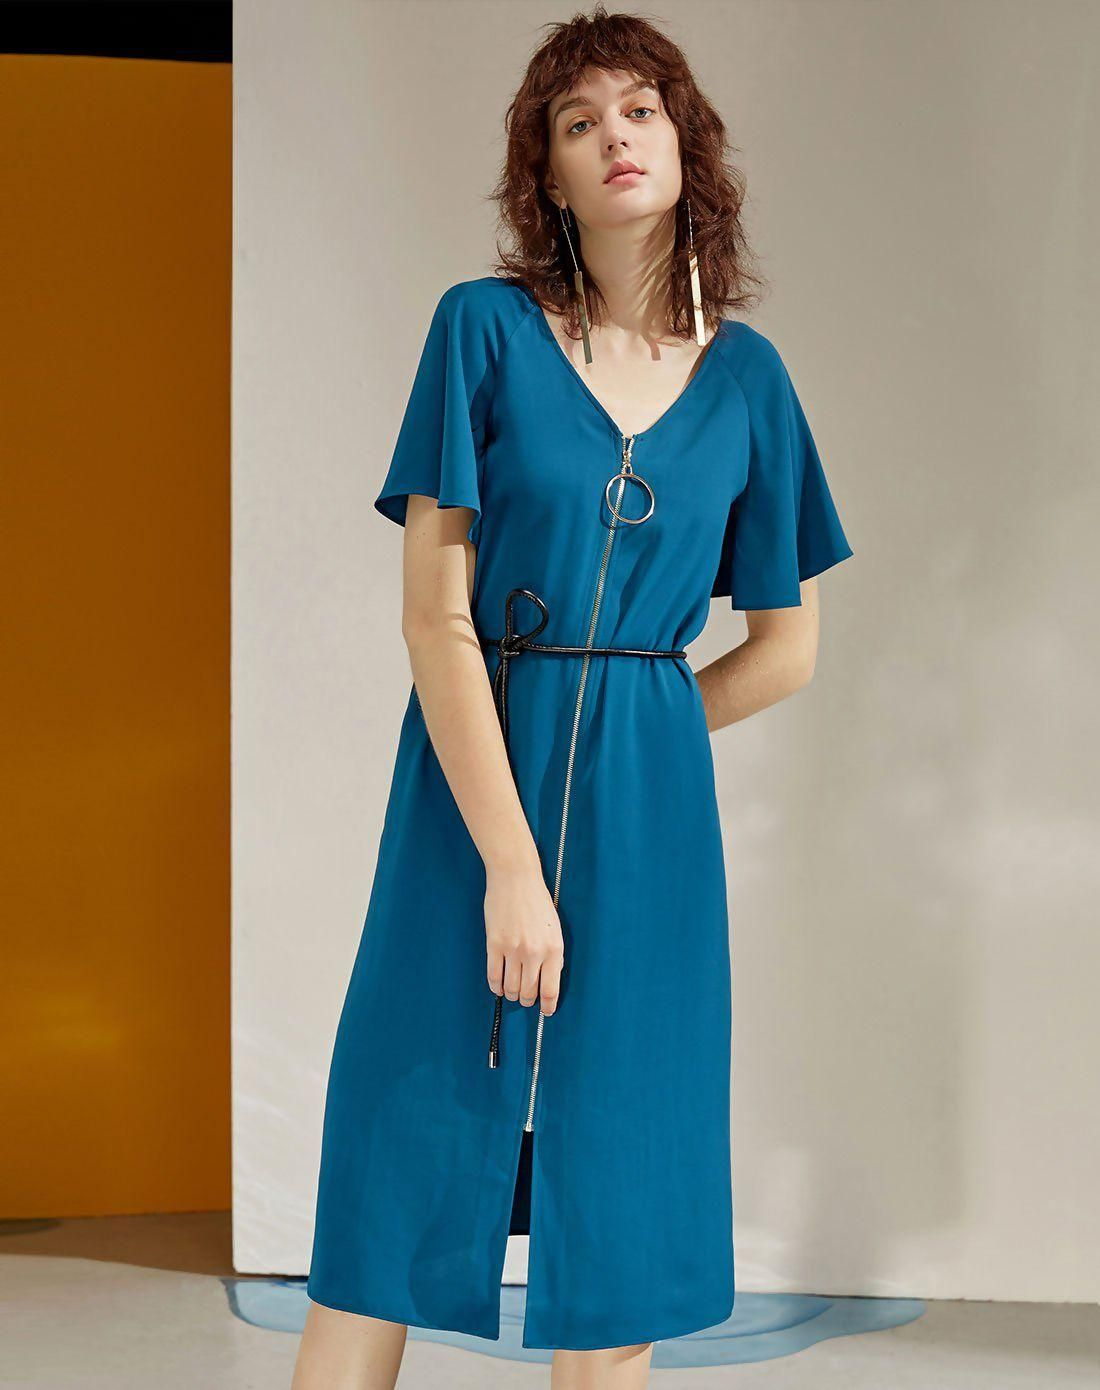 #VIPme (VIPSHOP Global) - #ARKMIIDO Marine Blue V Neck Short Sleeve Knee Length Women's Dress - AdoreWe.com